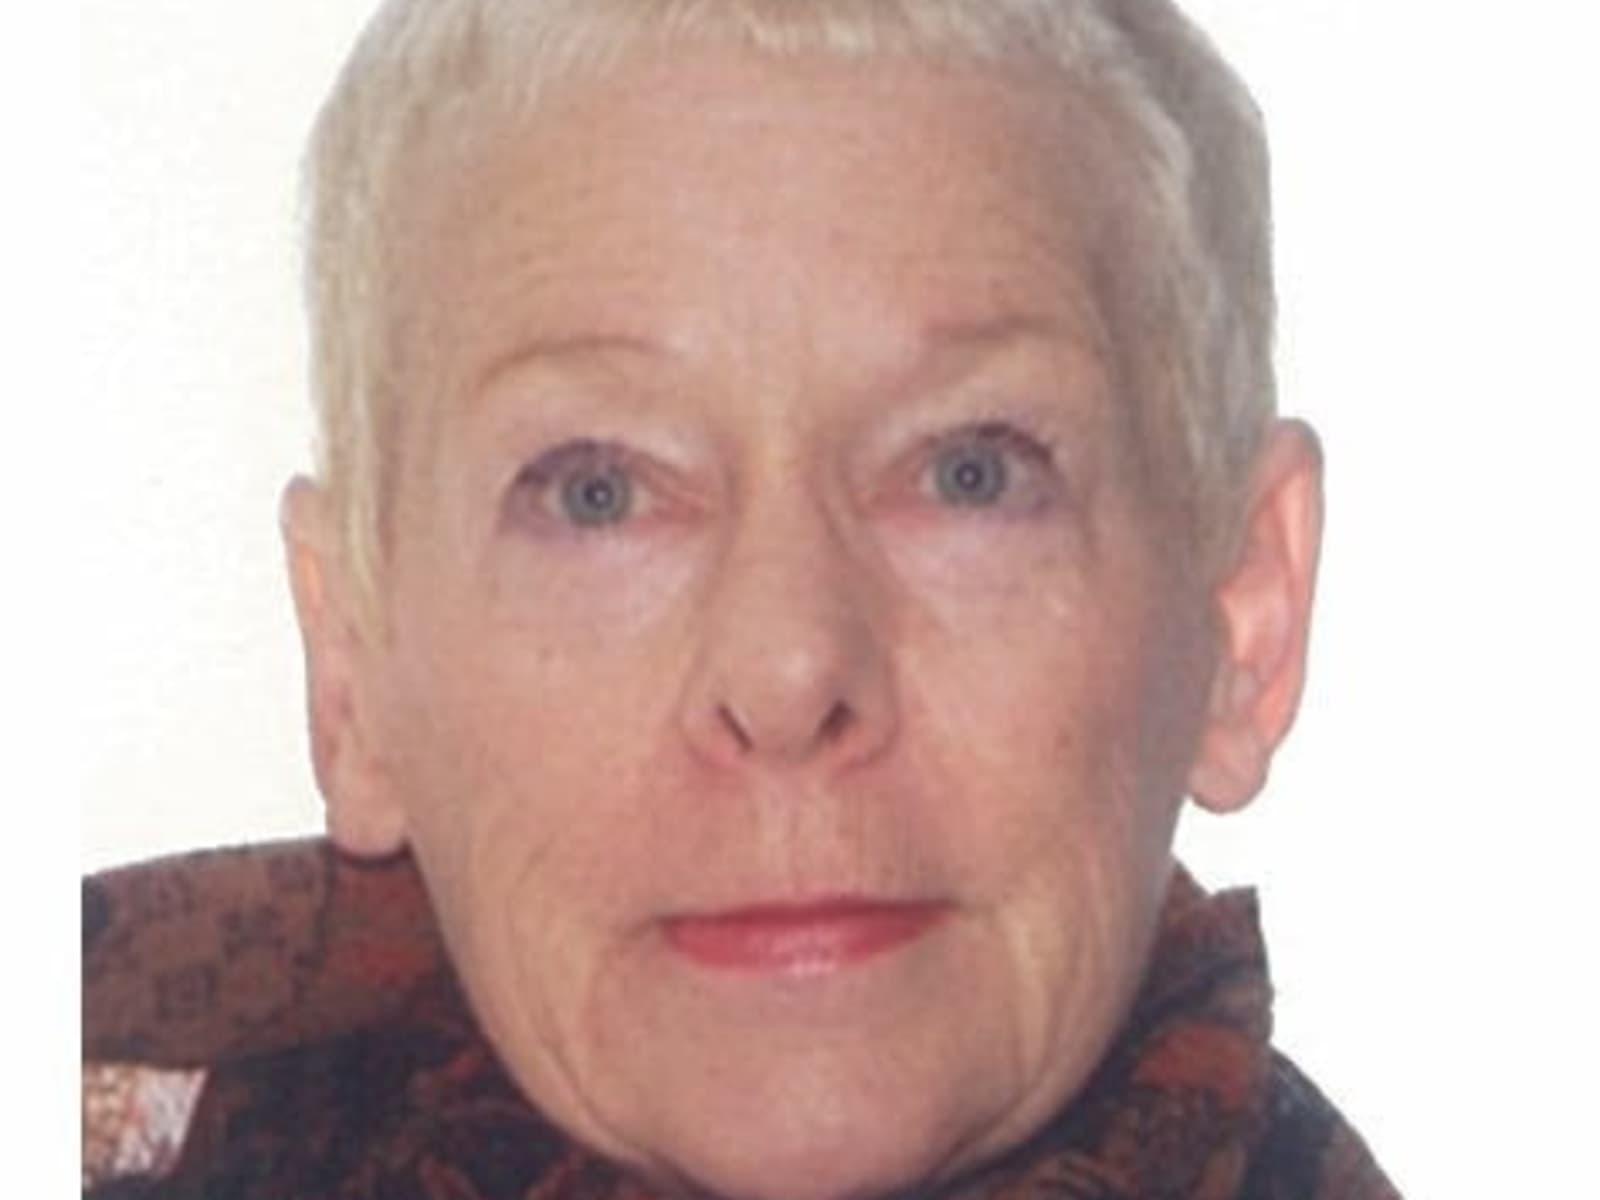 Judith from Melbourne, Victoria, Australia